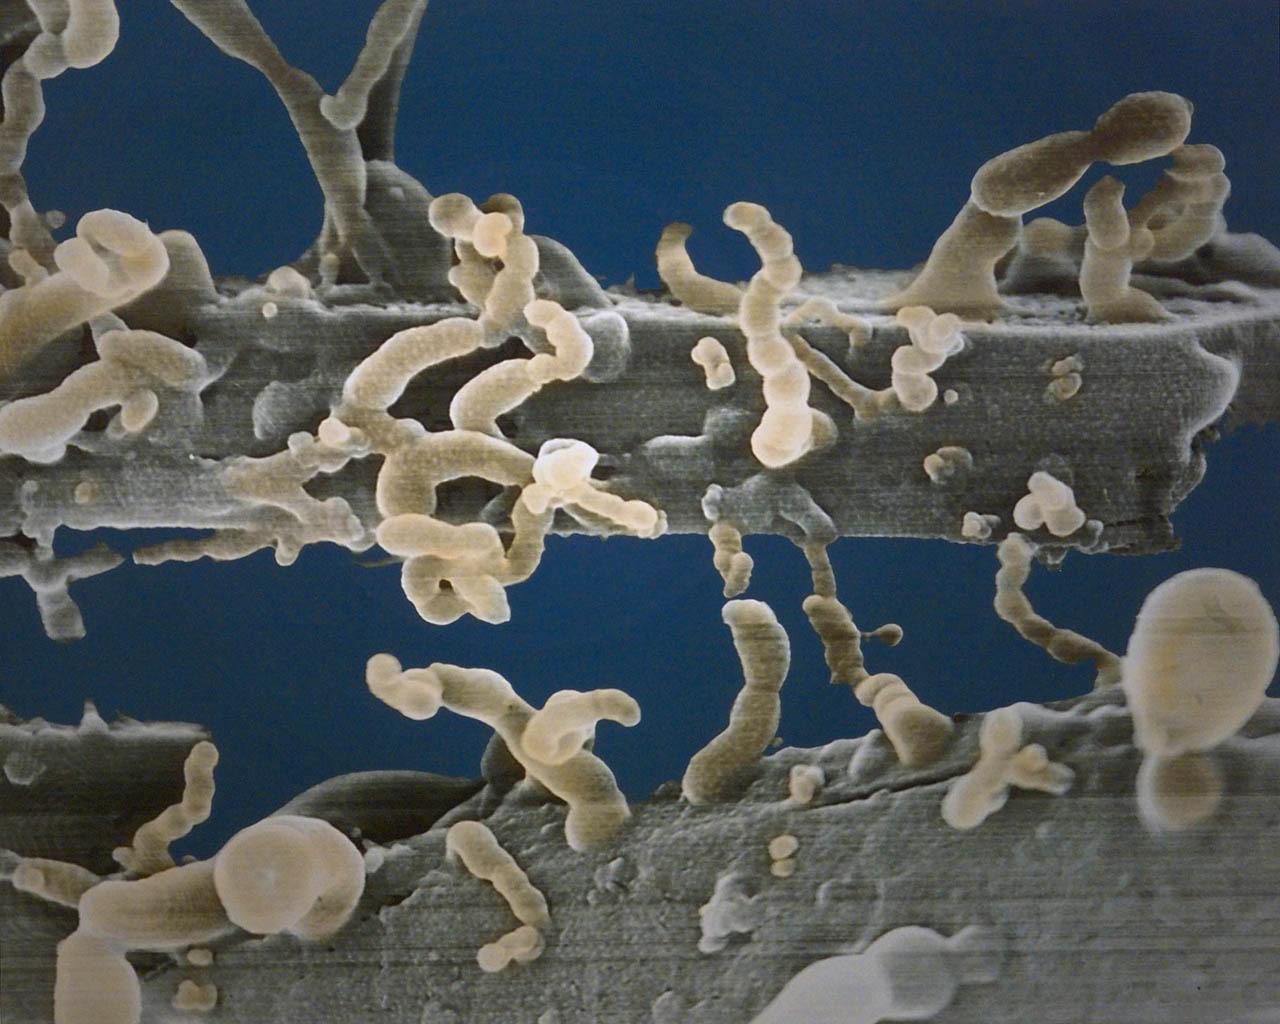 www.microscopy-uk.org.uk